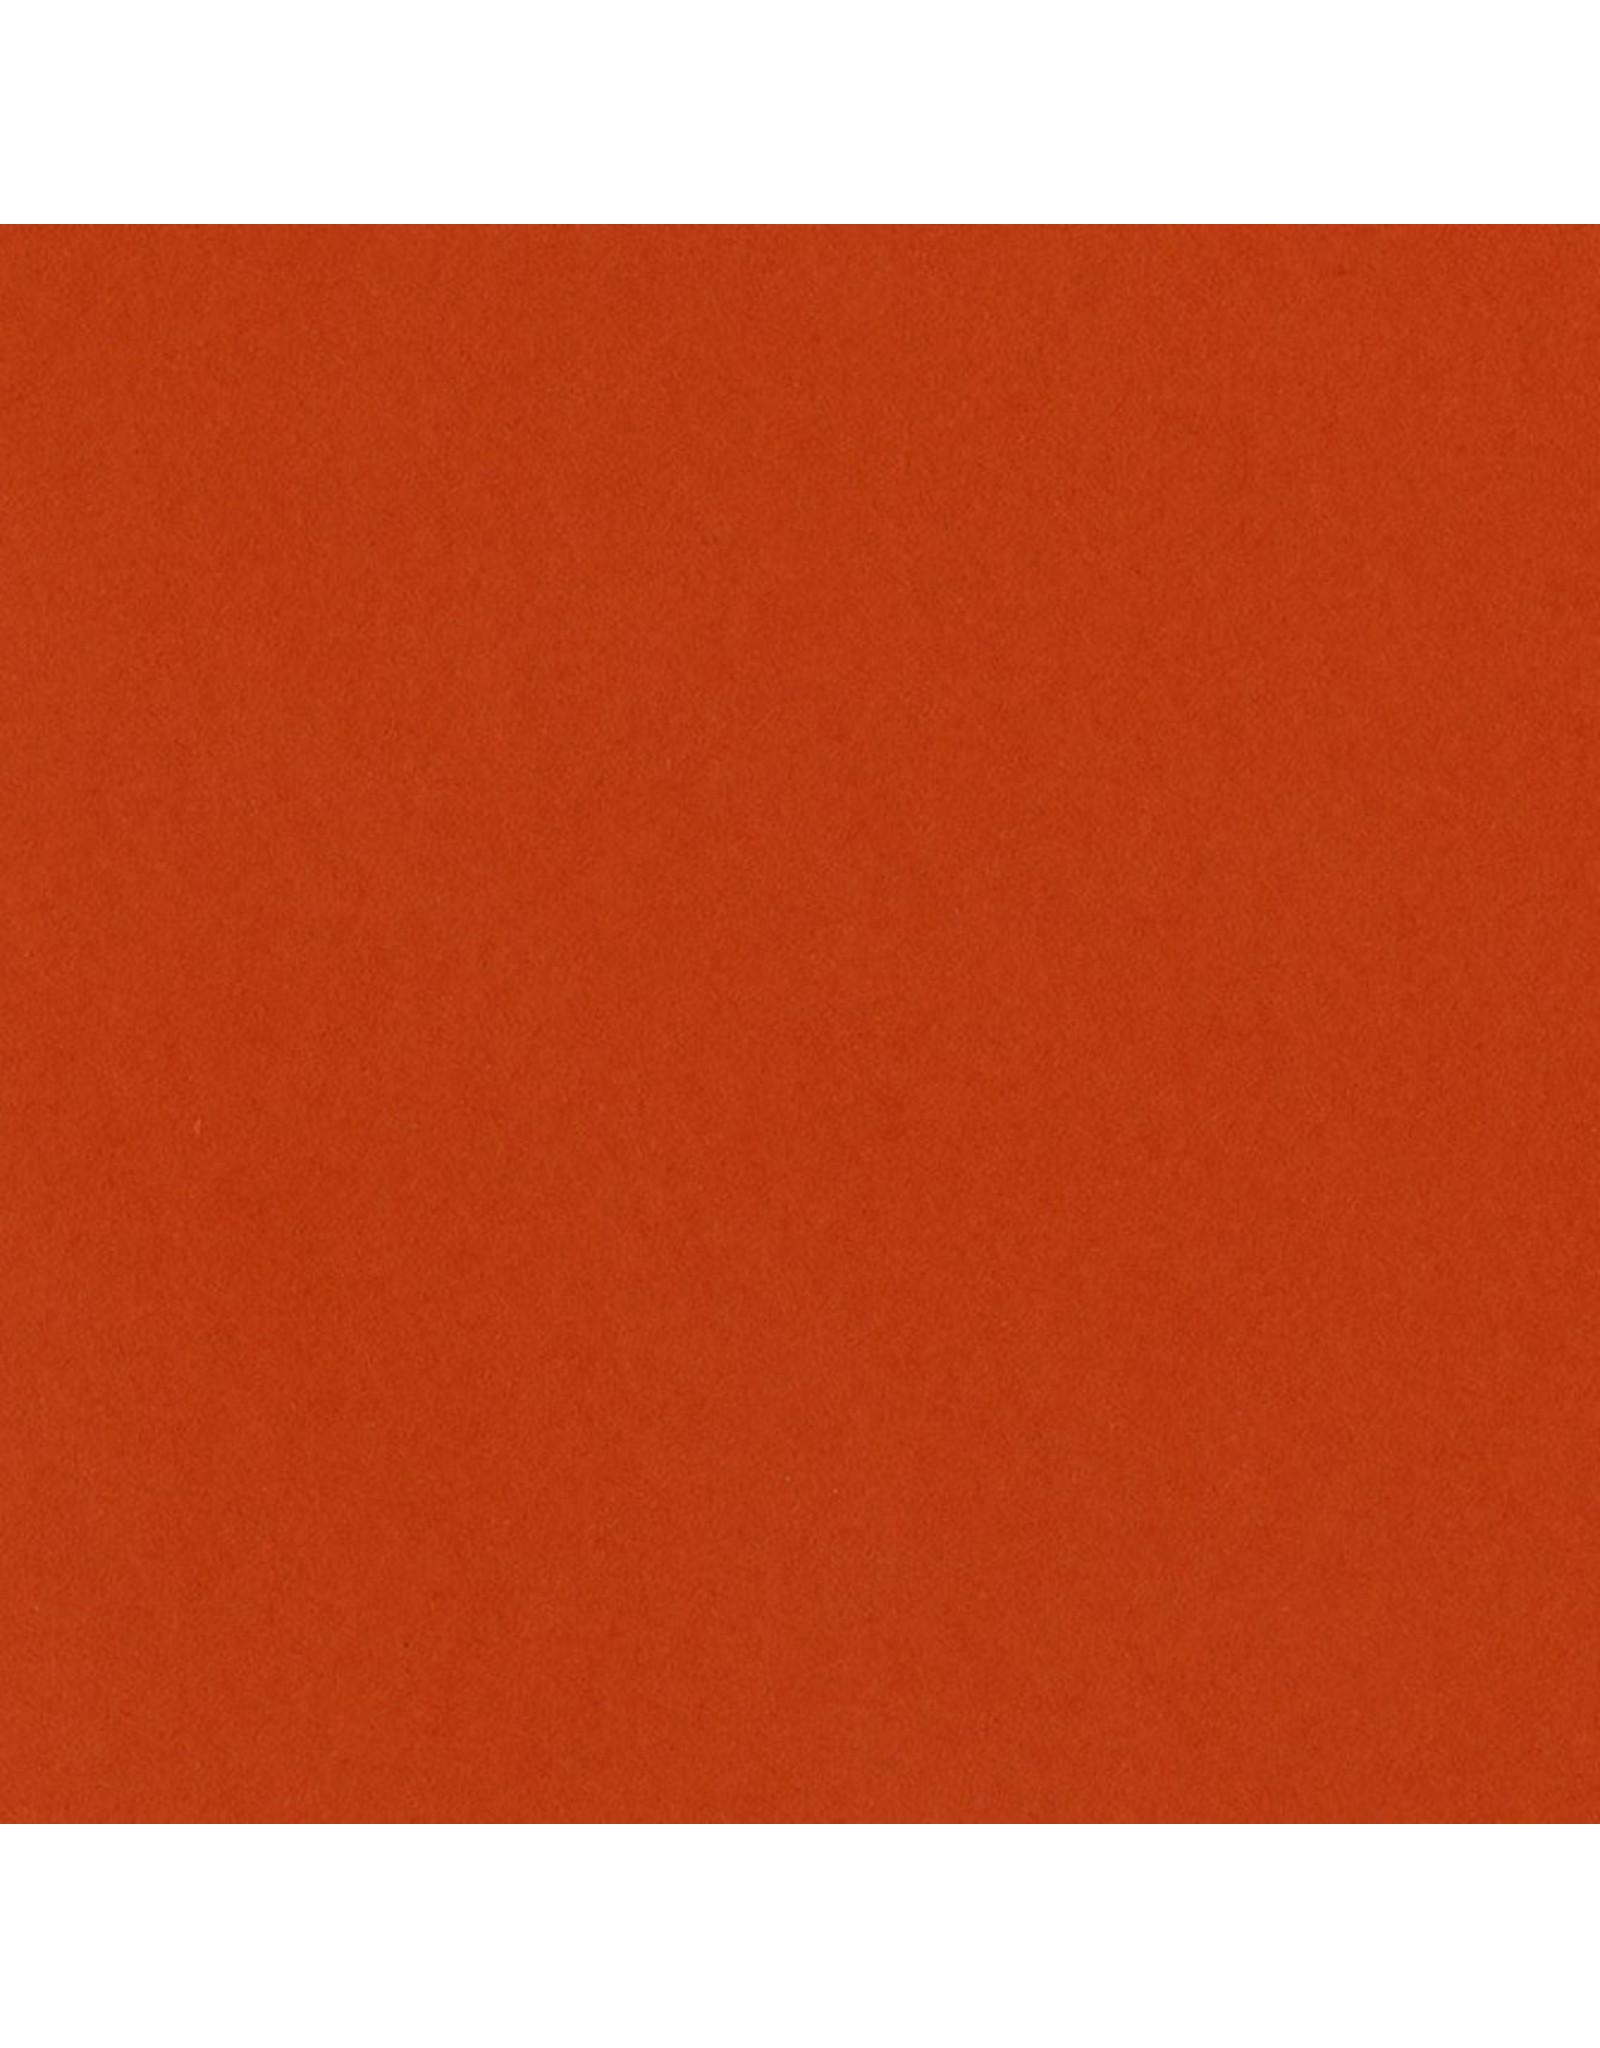 Bazzill Bazzill Card Shoppe 8.5x11 - Candy Corn